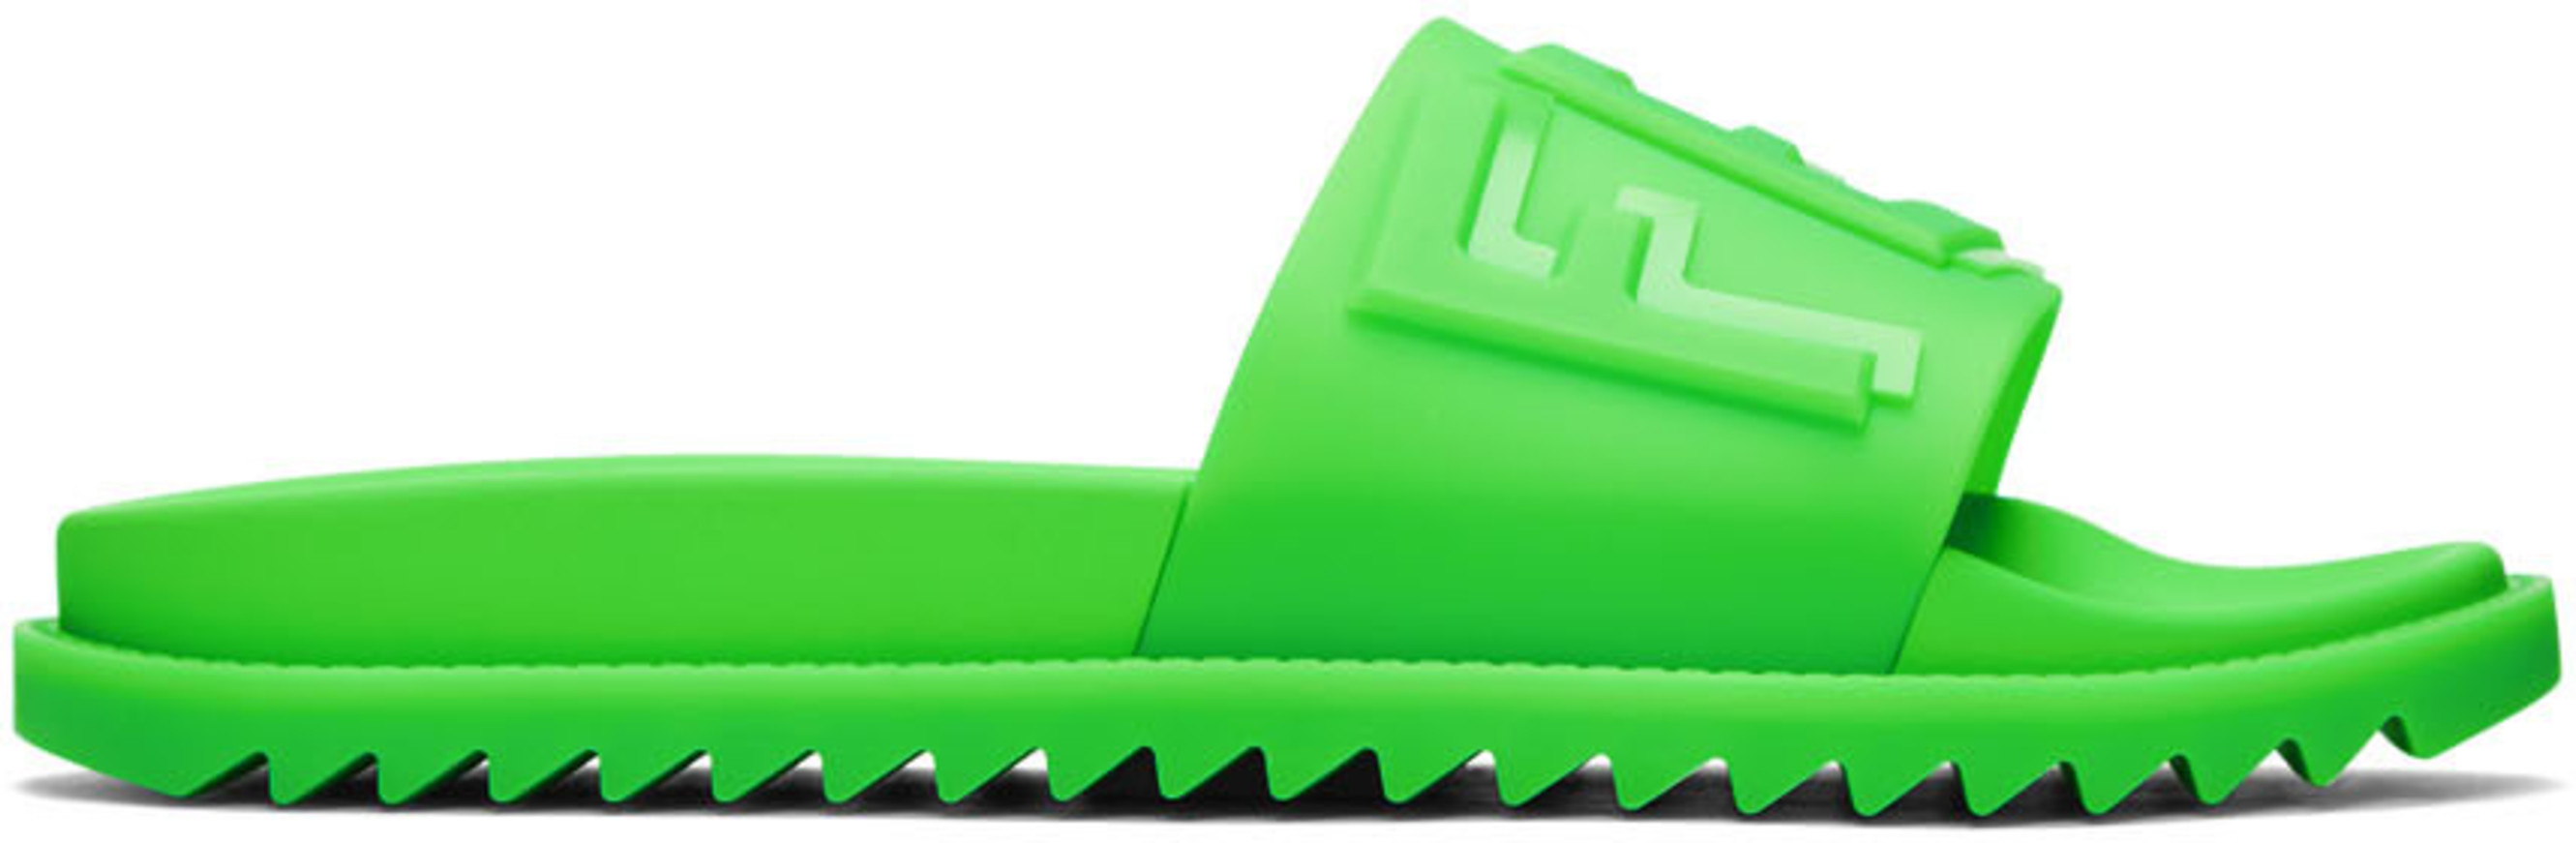 Sandales Sandales Sandales Vertes Vertes Vocabulary Enfiler Enfiler À Enfiler À Vertes Vocabulary À SMqpUVGz